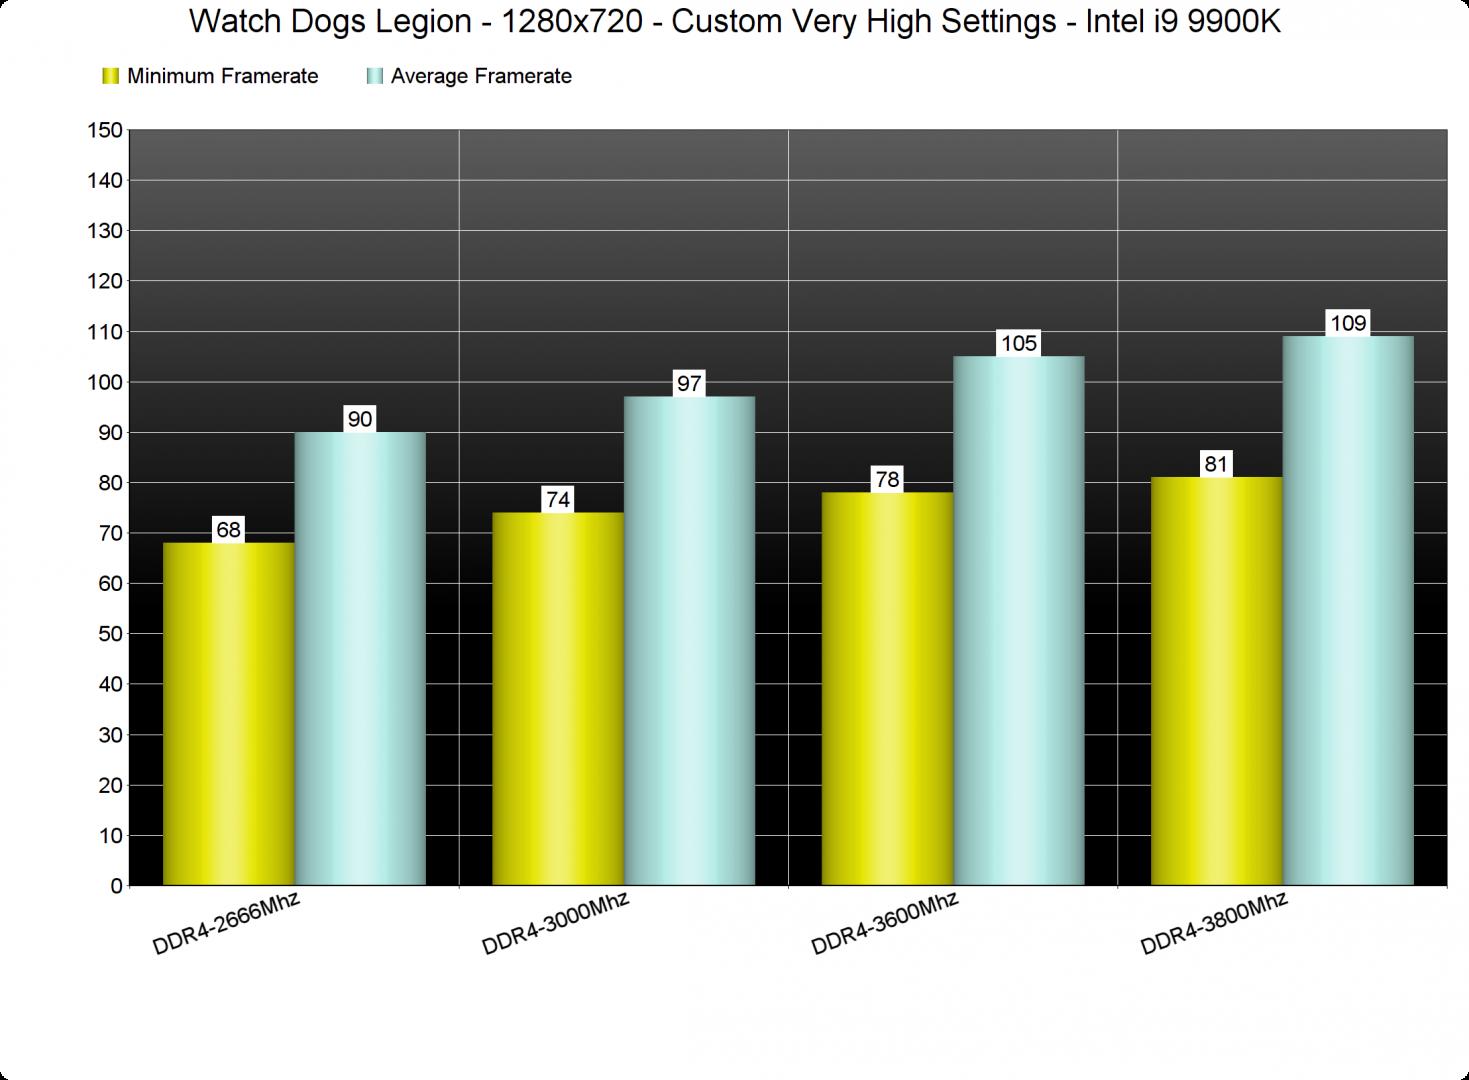 Watch Dogs Legion RAM frequency benchmarks